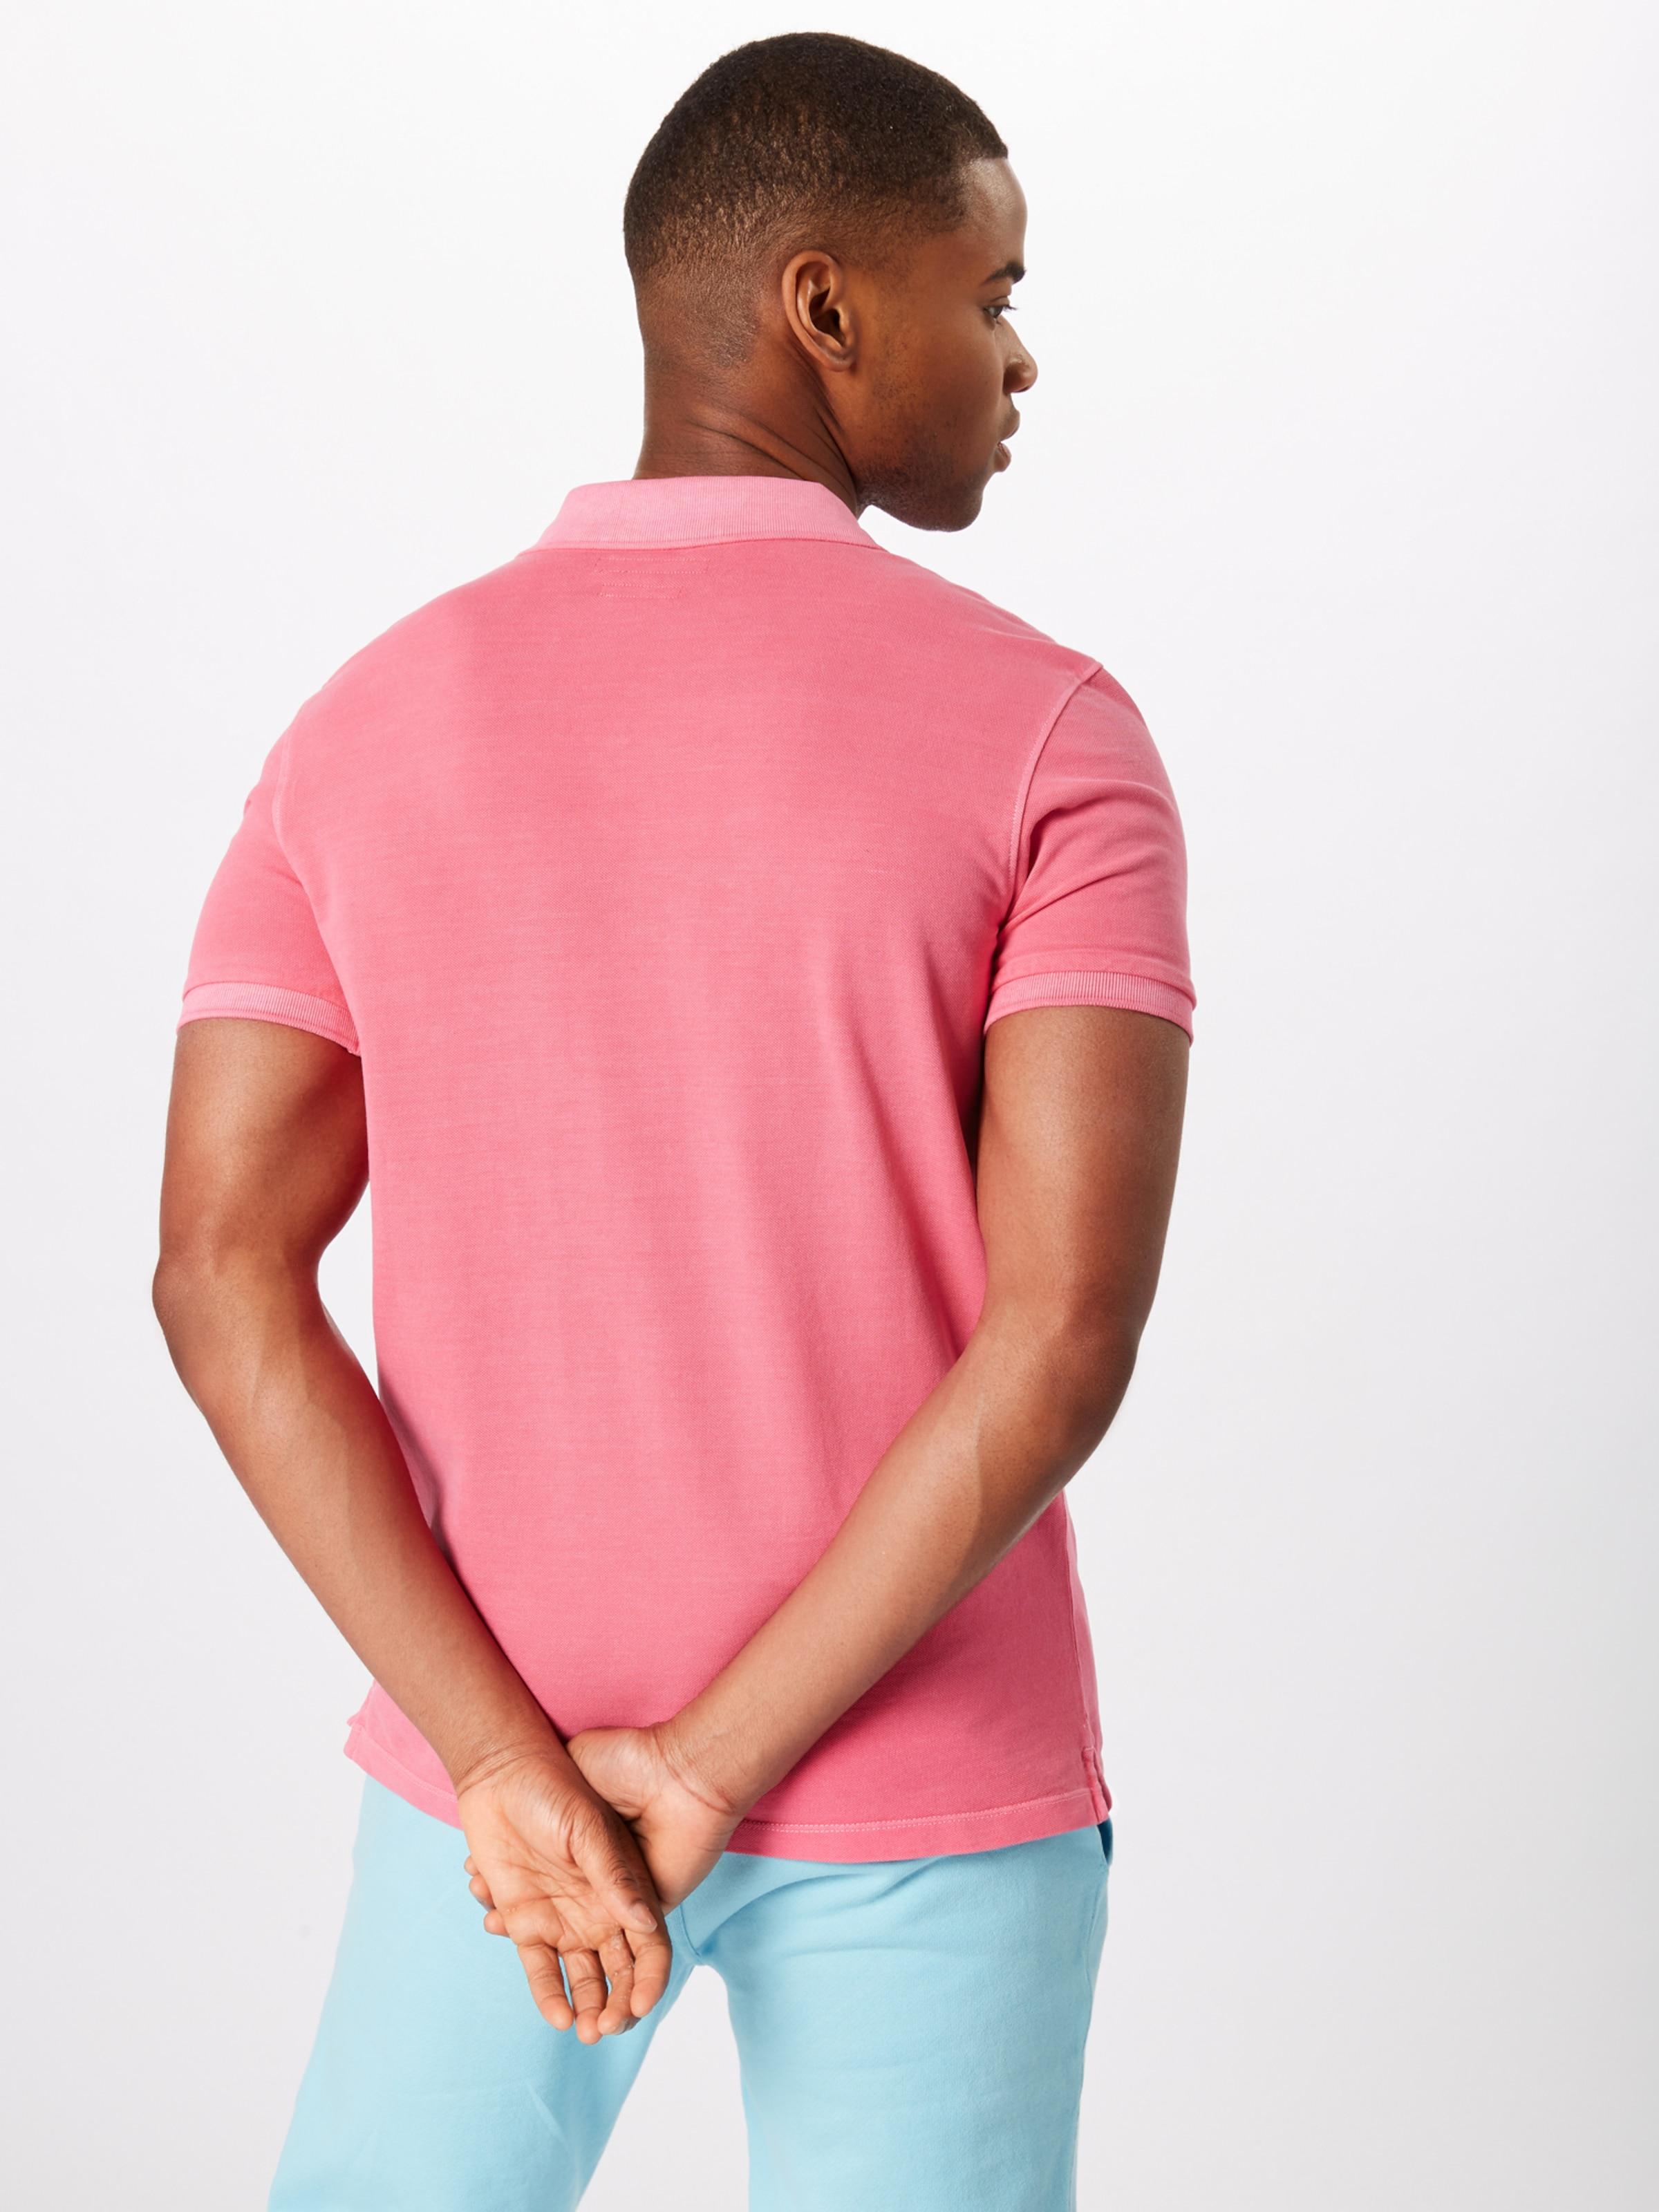 Marc En shirt Rose T O'polo 7yvYbfg6